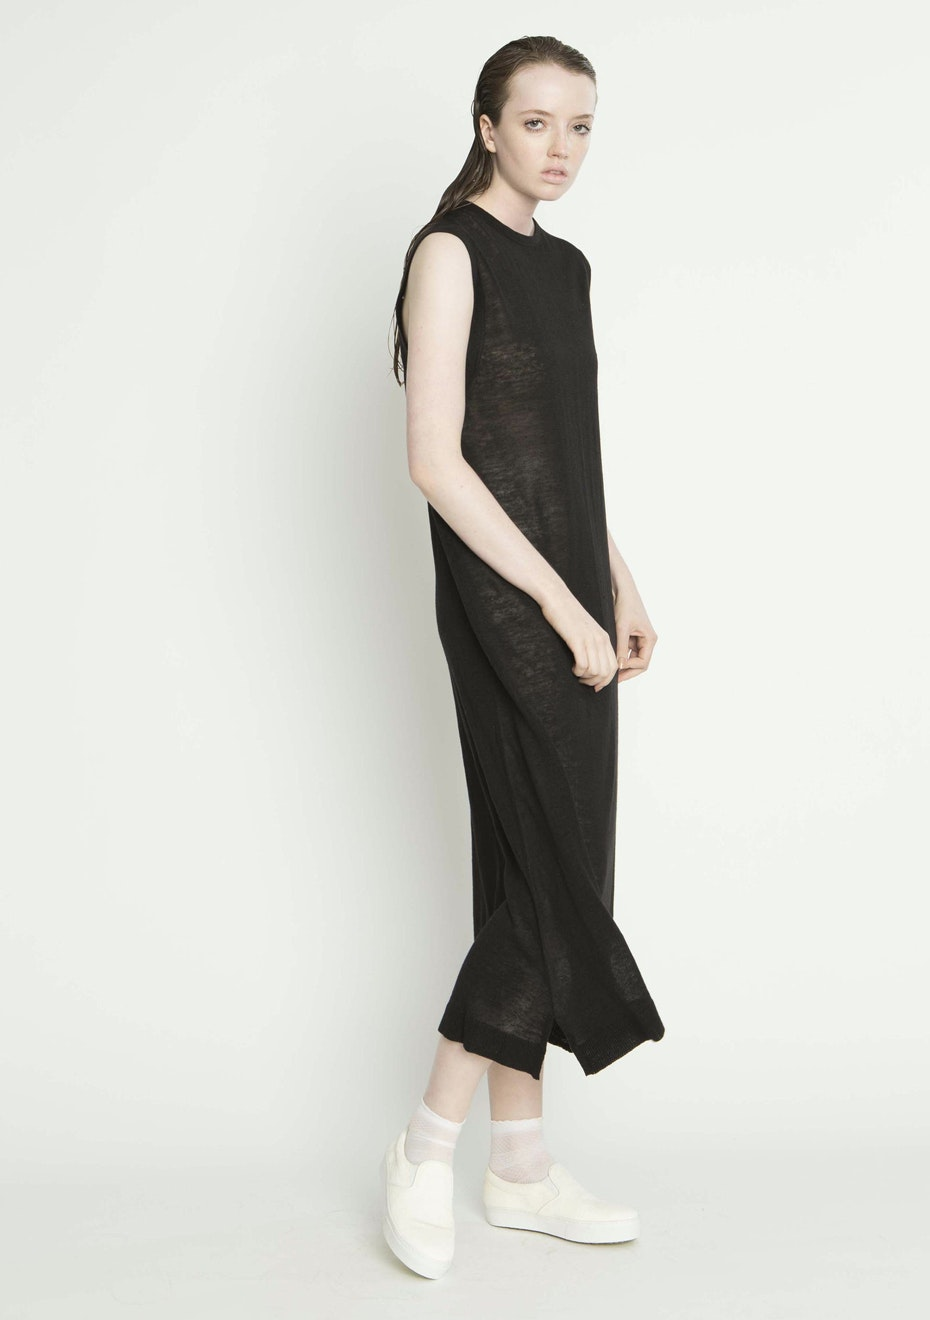 Salasai - RELAX TANK DRESS - BLACK